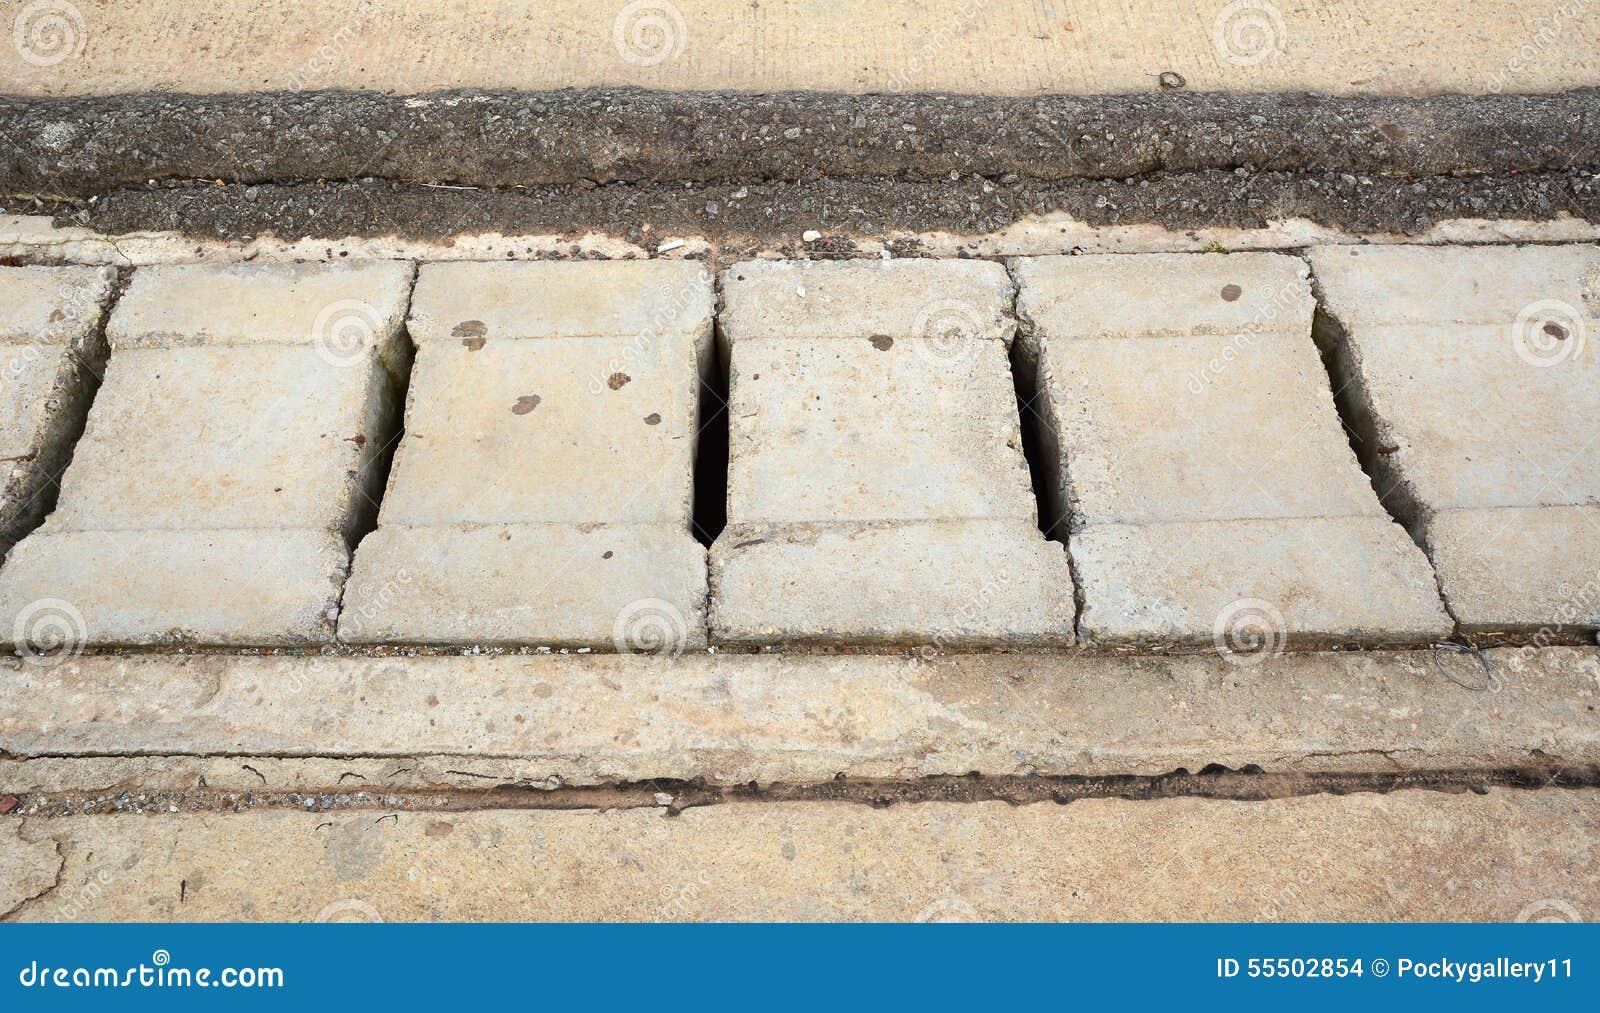 Street Concrete Or Cement Drain Grate Stock Photo Image